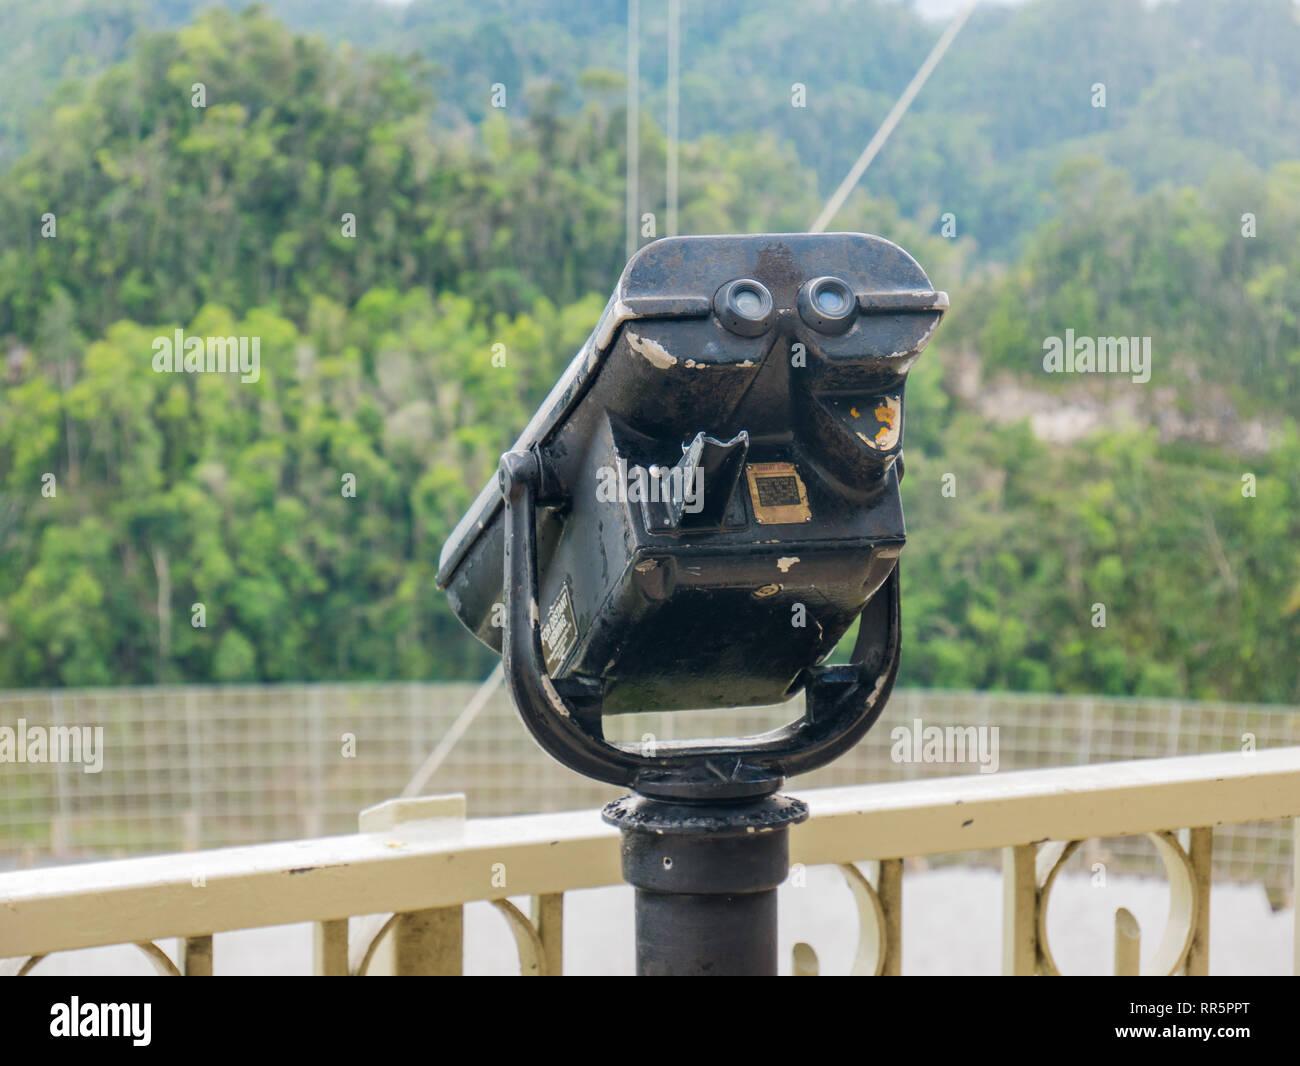 Old Binoculars at Arecibo, Puerto Rico, USA. - Stock Image